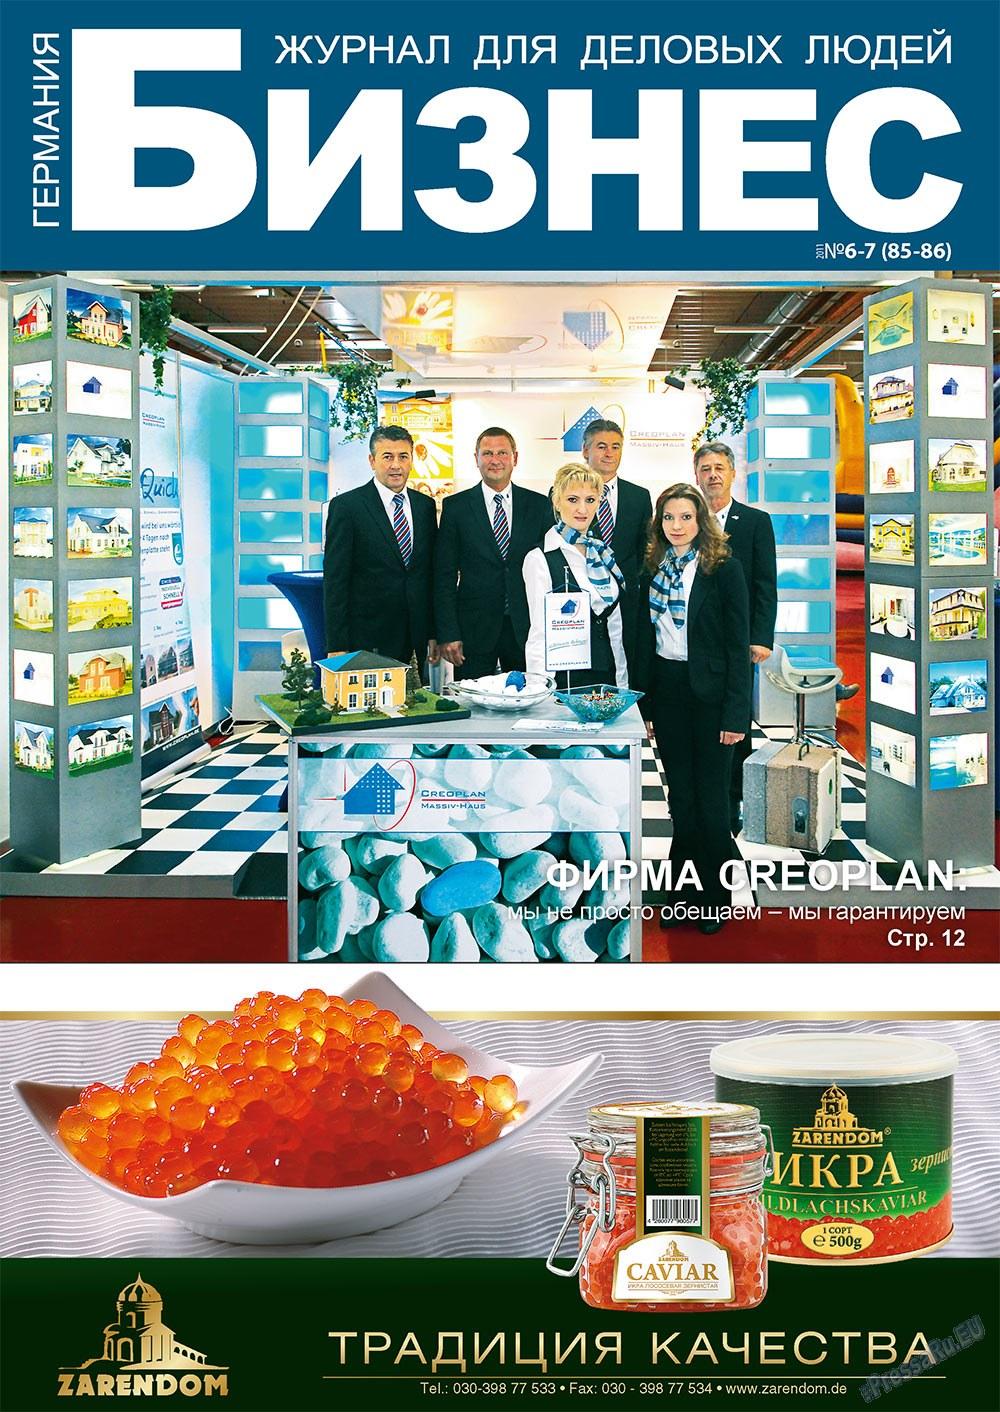 Бизнес (журнал). 2011 год, номер 6, стр. 1